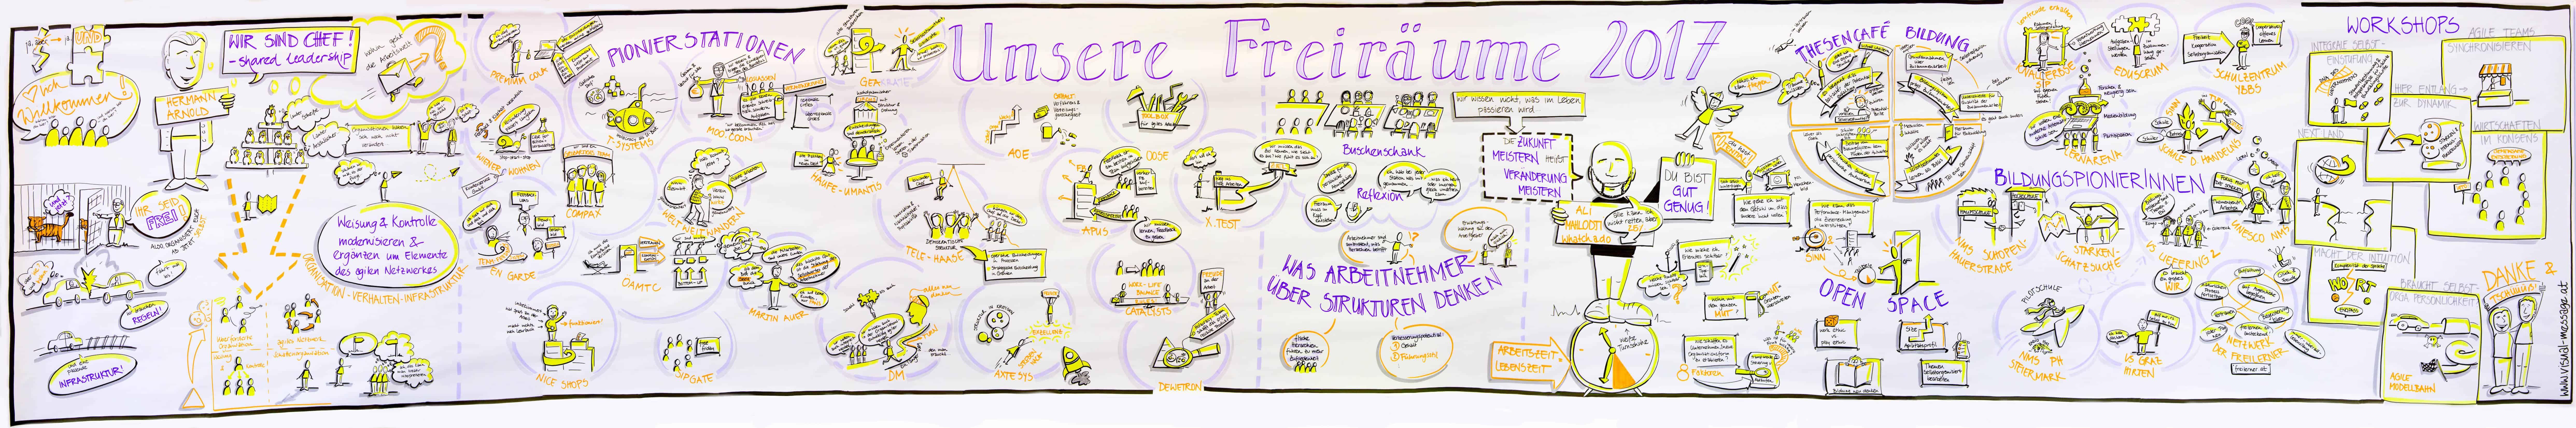 Graphic Recording Freiräume (Un)Conference 2017